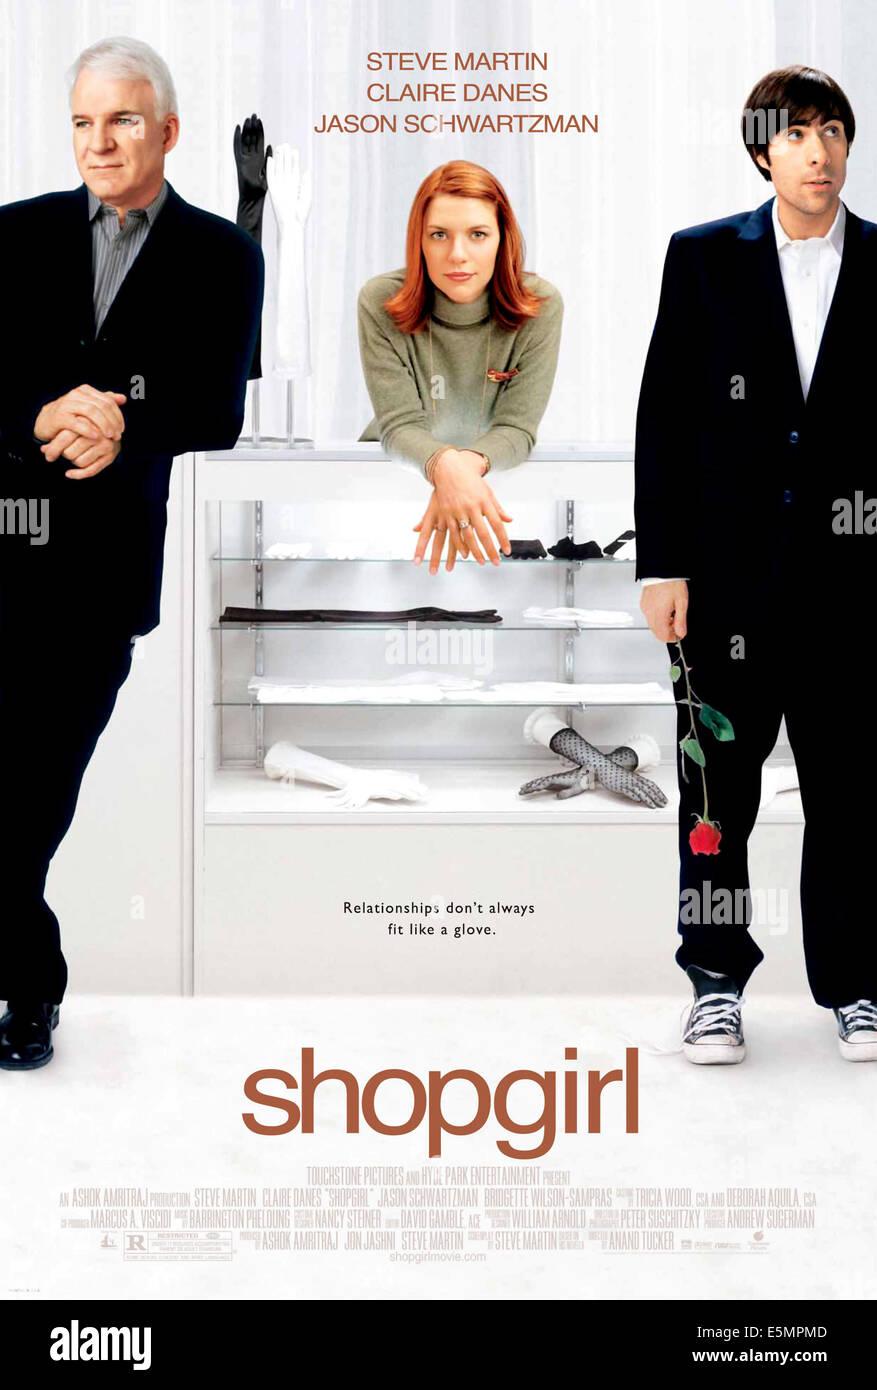 SHOPGIRL, Steve Martin, Claire Danes, Jason Schwartzman, poster art, 2005 - Stock Image